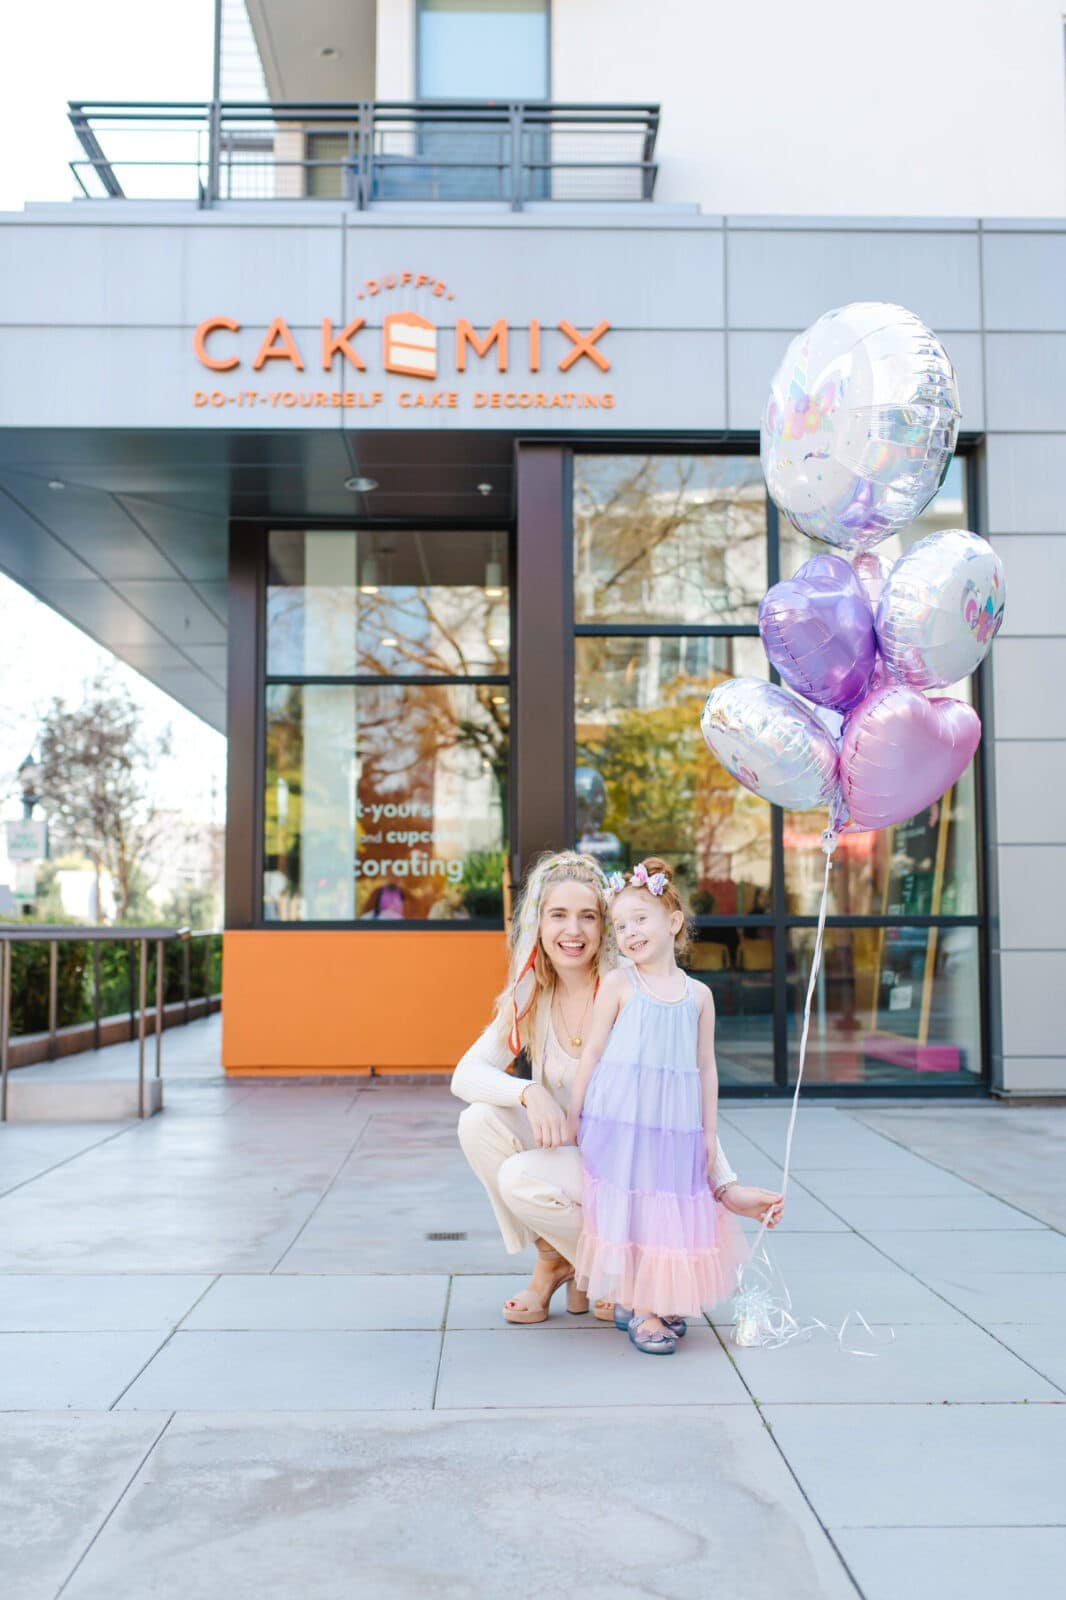 Lila's 5th Birthday At Duff's Cakemix